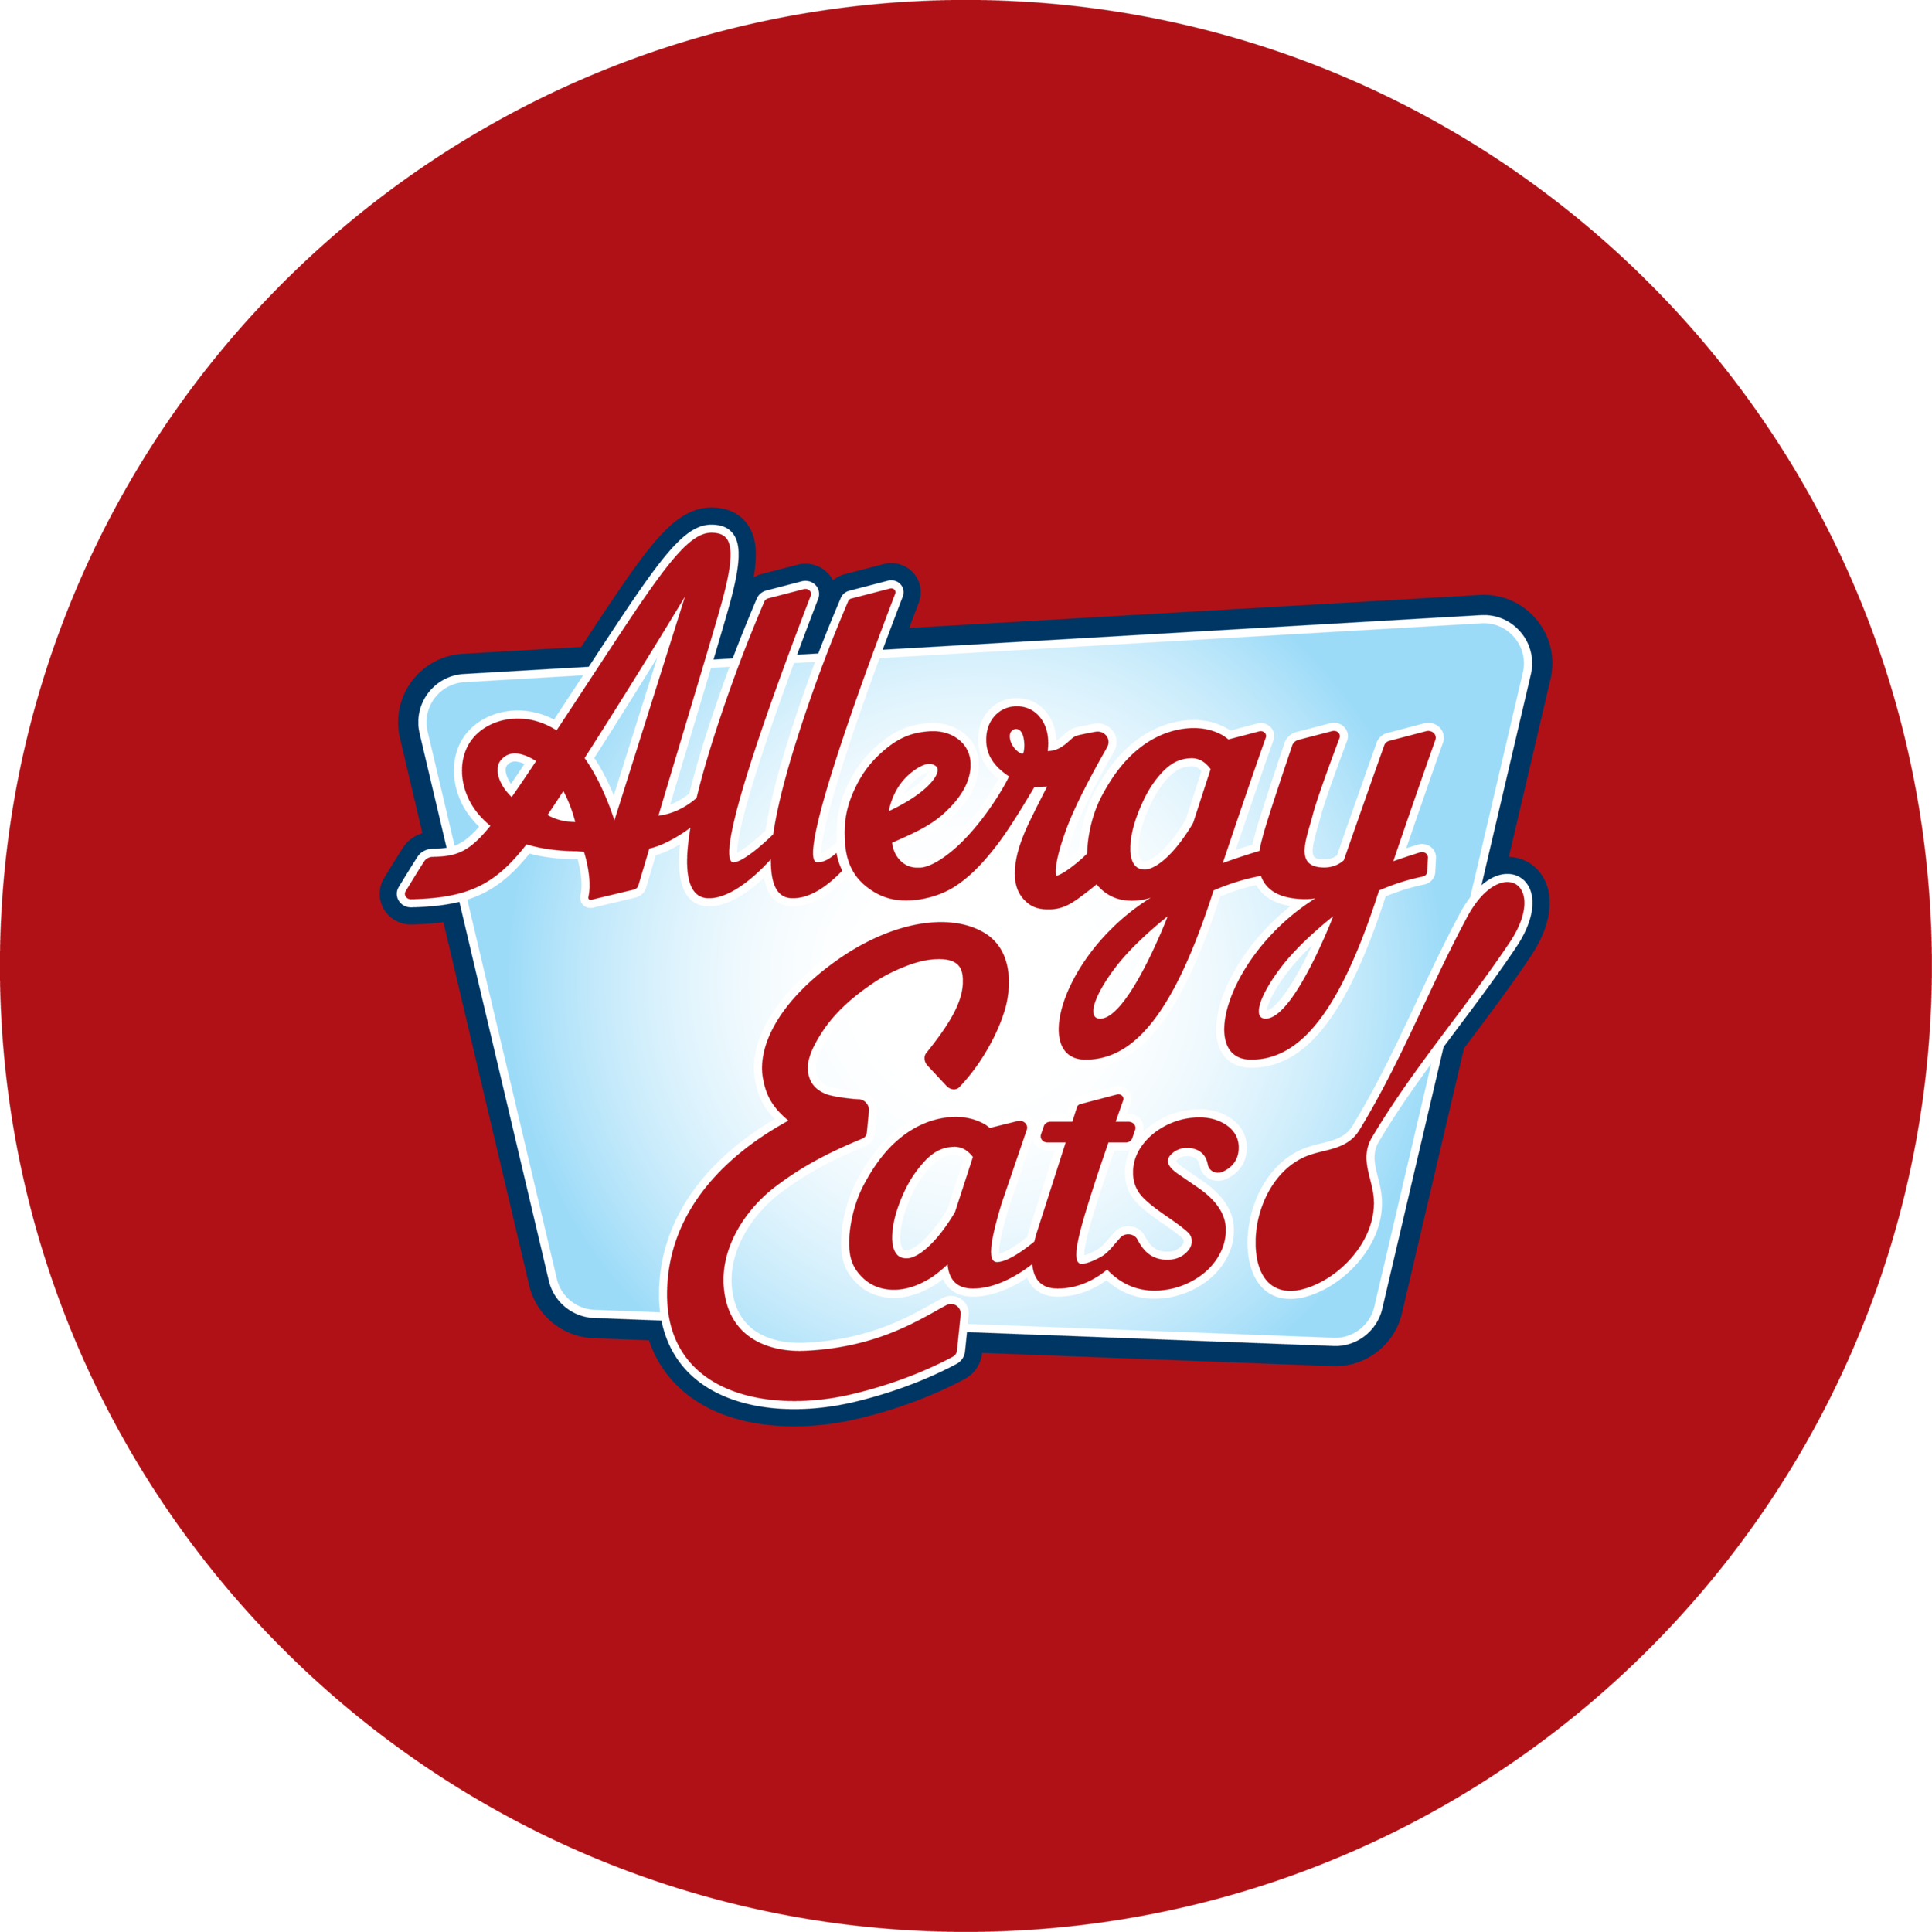 allergyeats.png